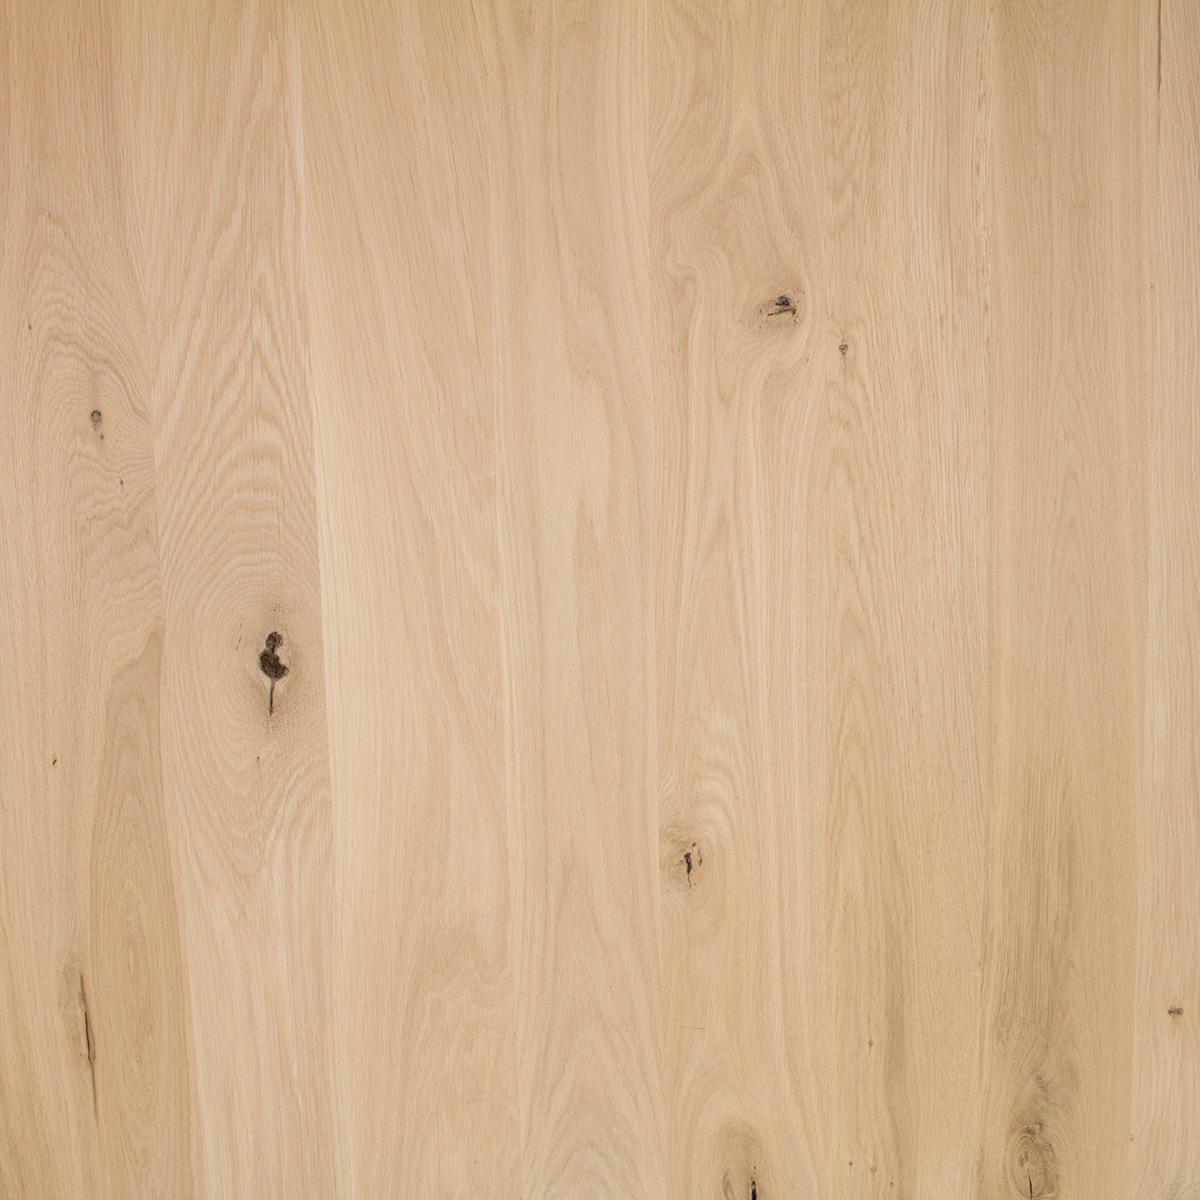 Eiken paneel rustiek 3 cm - 122 cm breed - vaste lengtestaffels - Meubelblad 8-12% kd Europees eikenhout